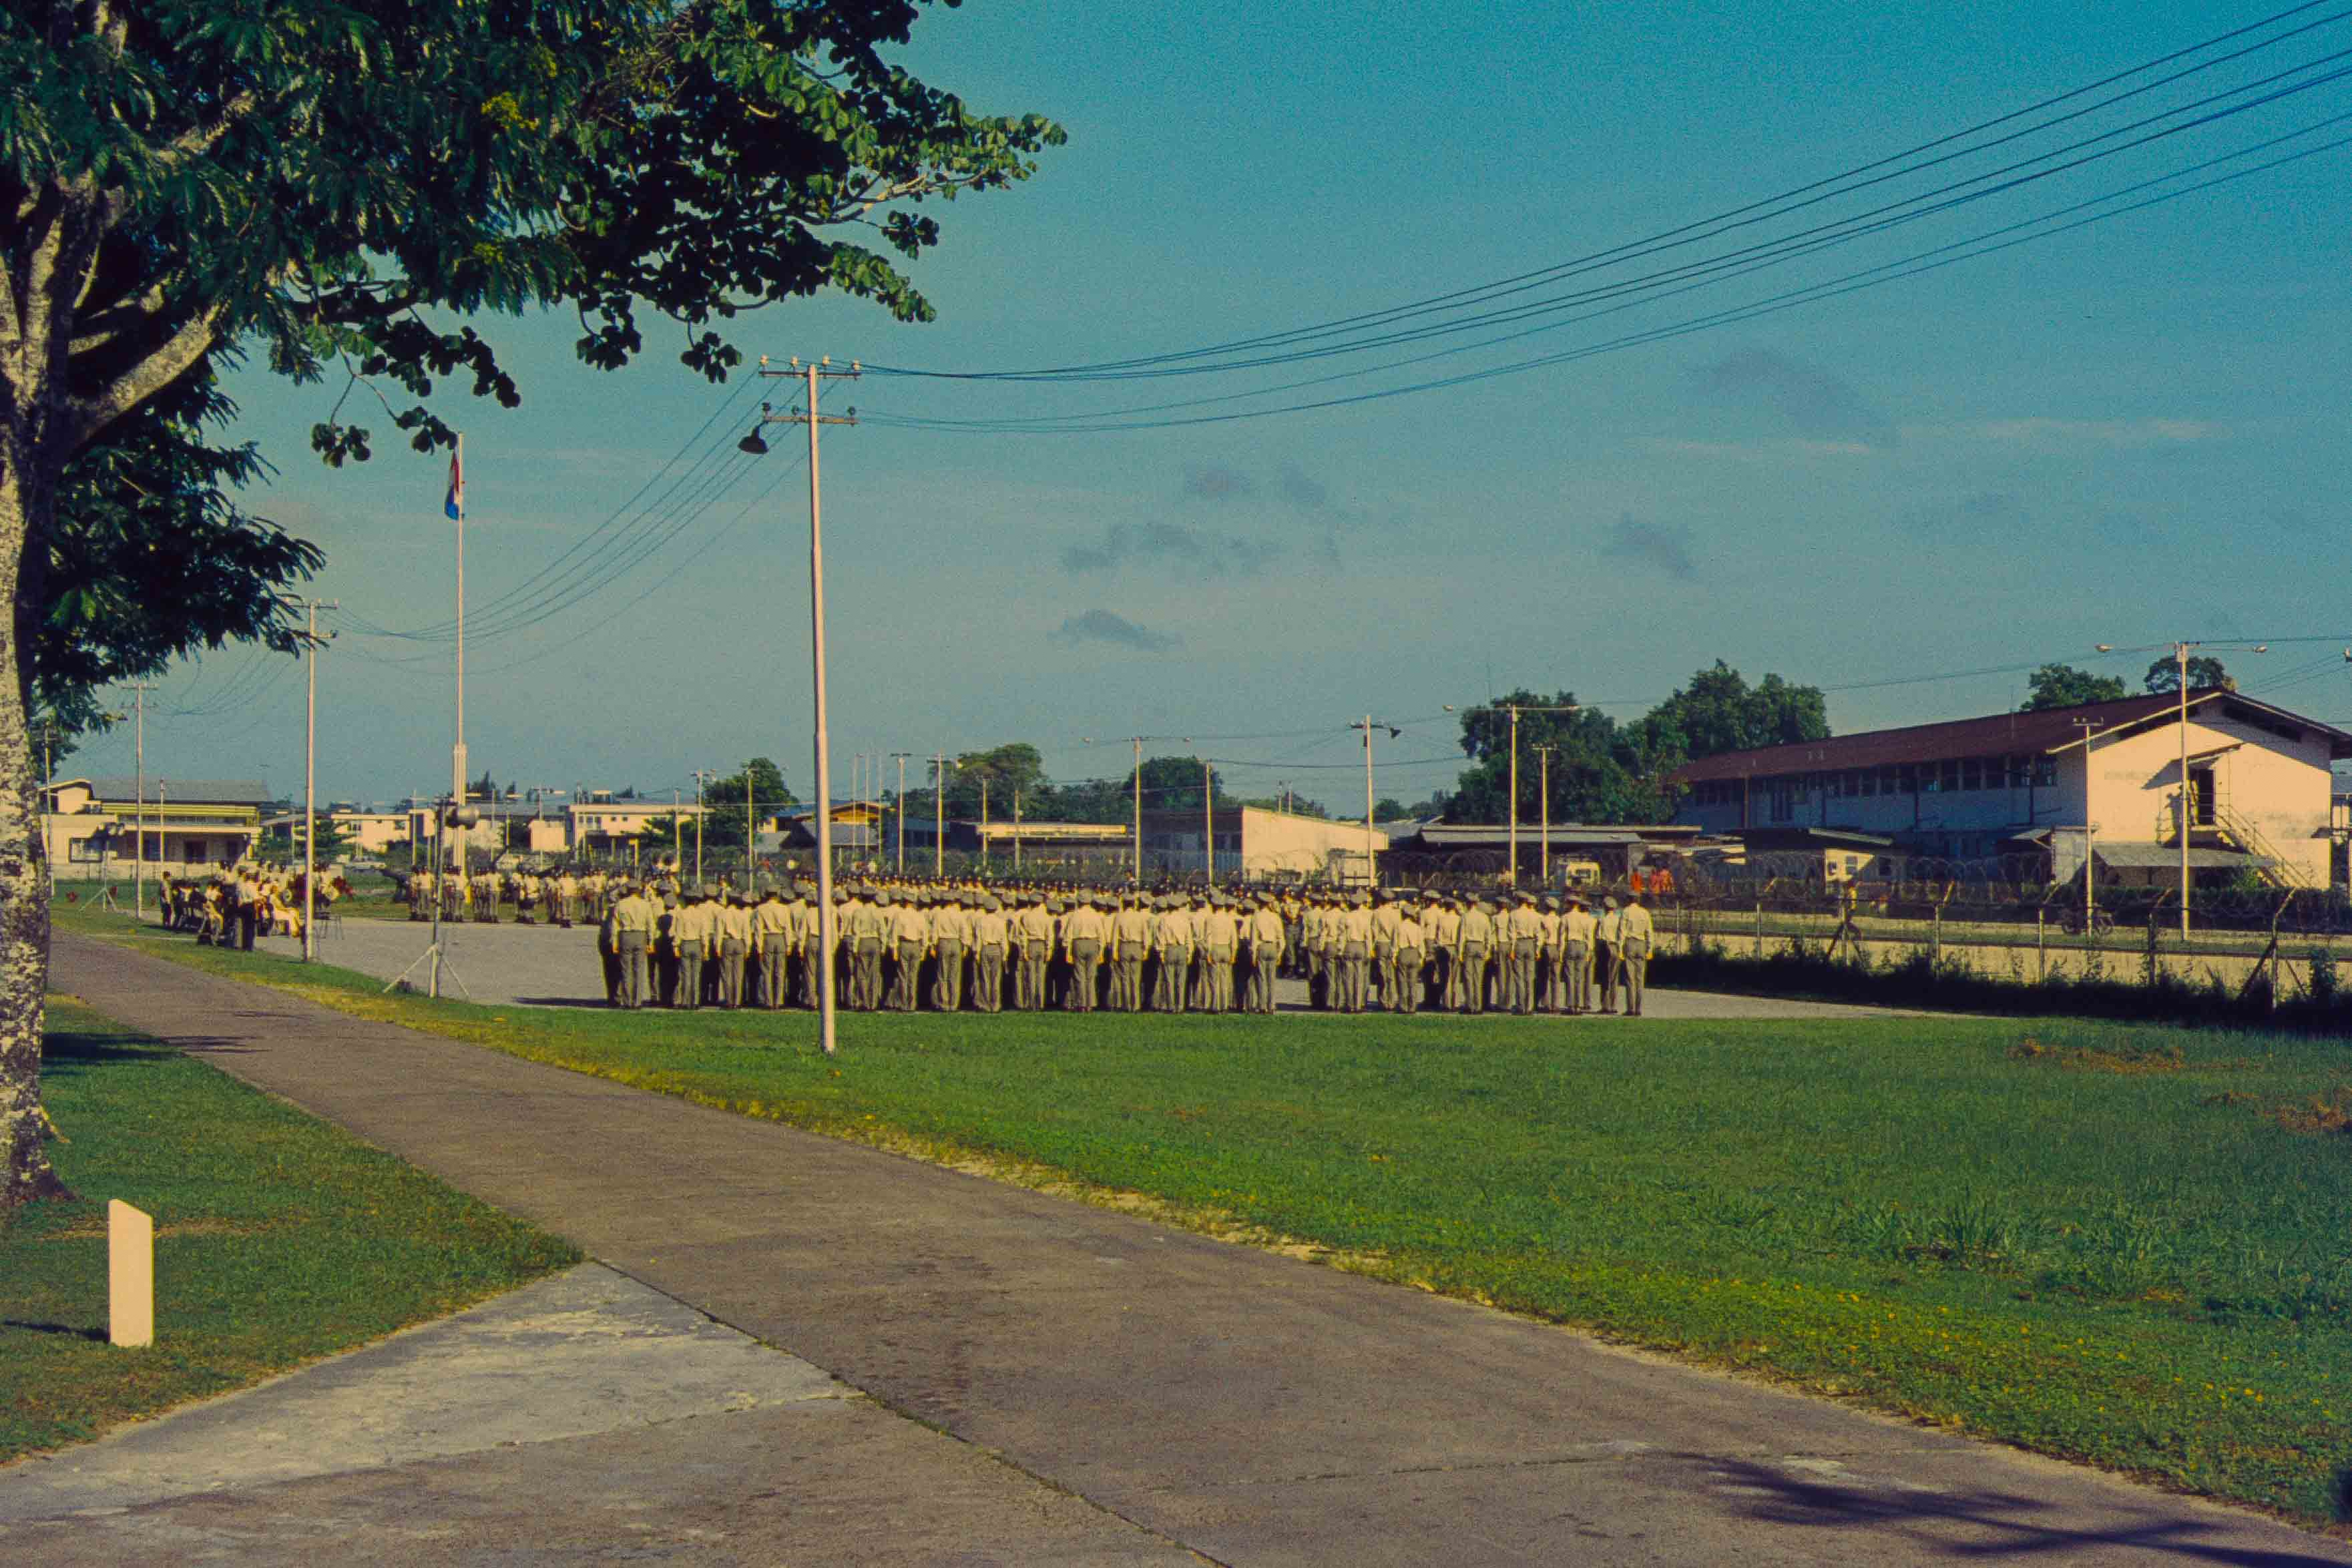 296. Suriname